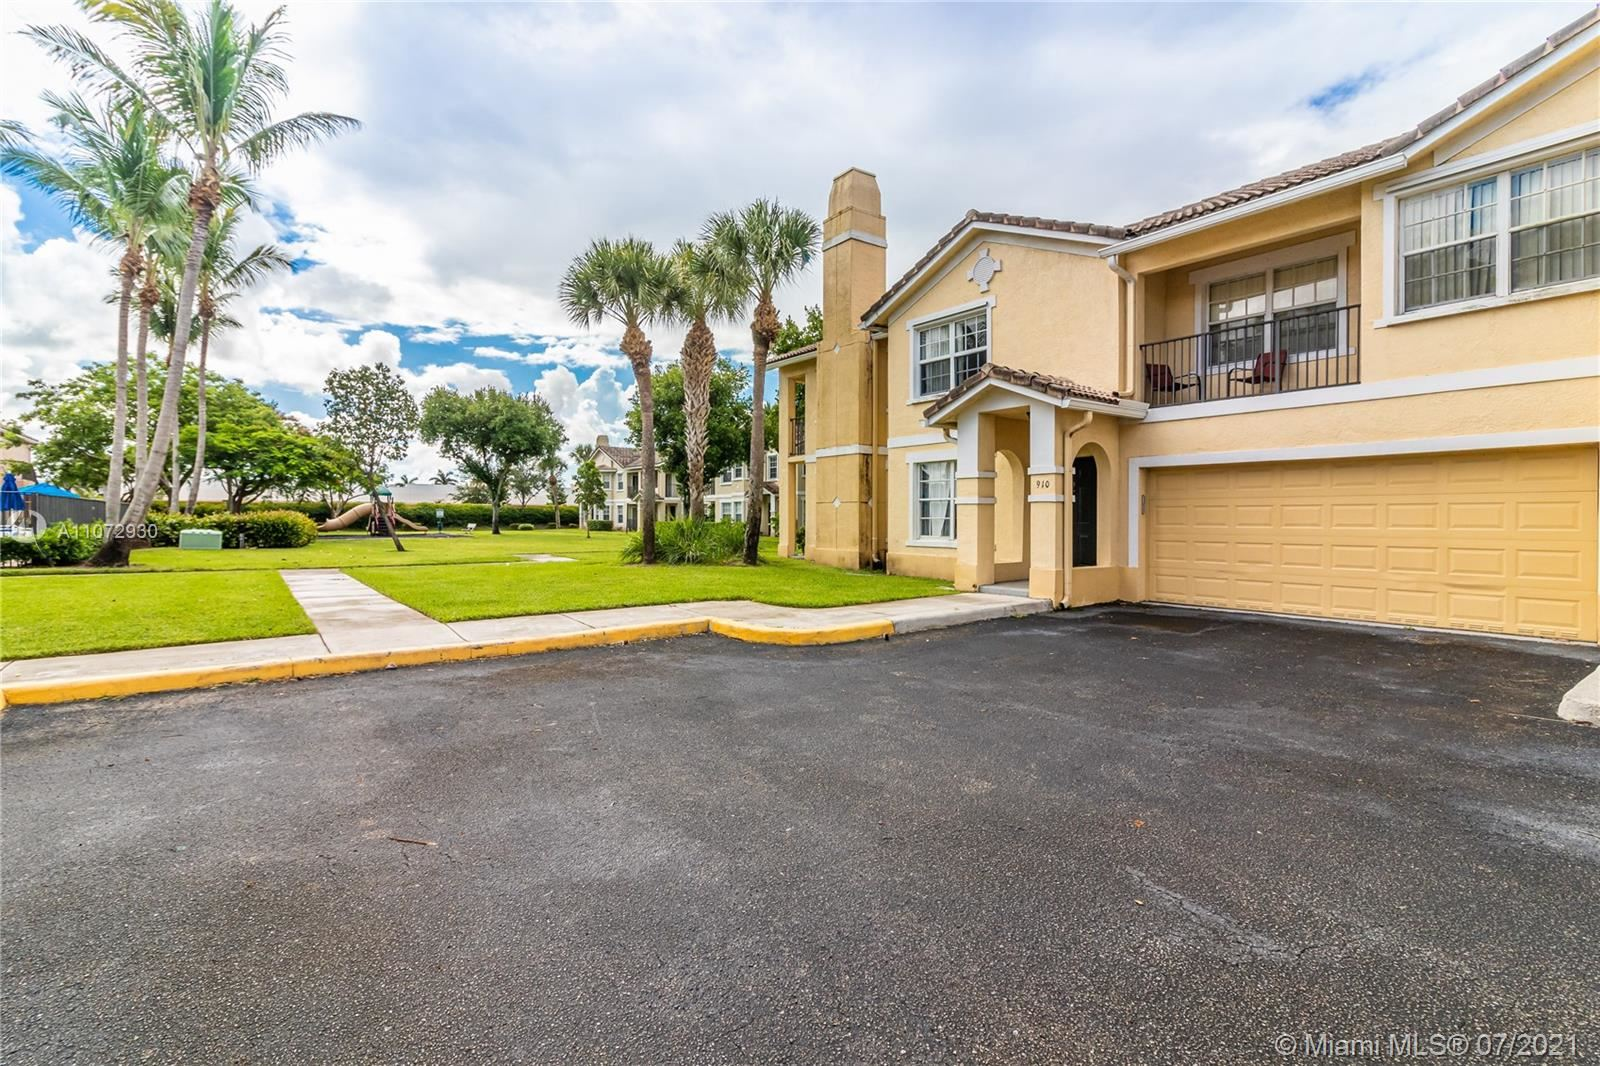 Photo of 910 Belmont Ln #910, North Lauderdale, FL 33068 (MLS # A11072930)